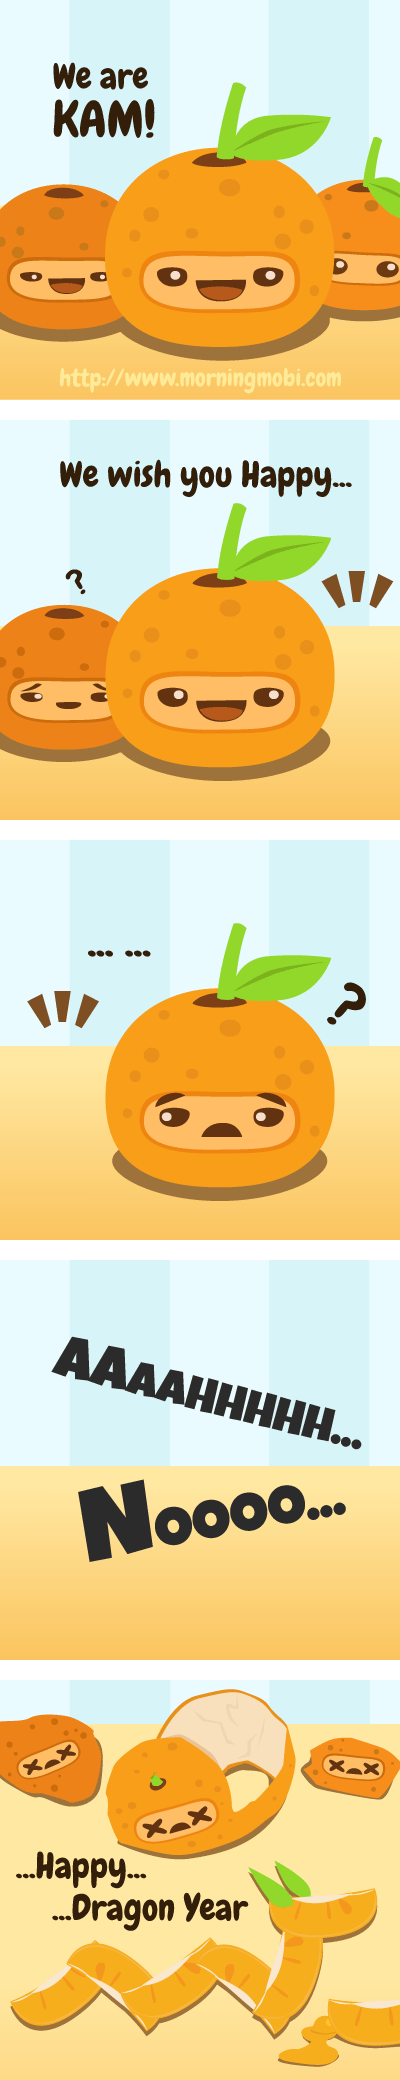 Happy Orange Dragon Year - Morningmobi Web Comics